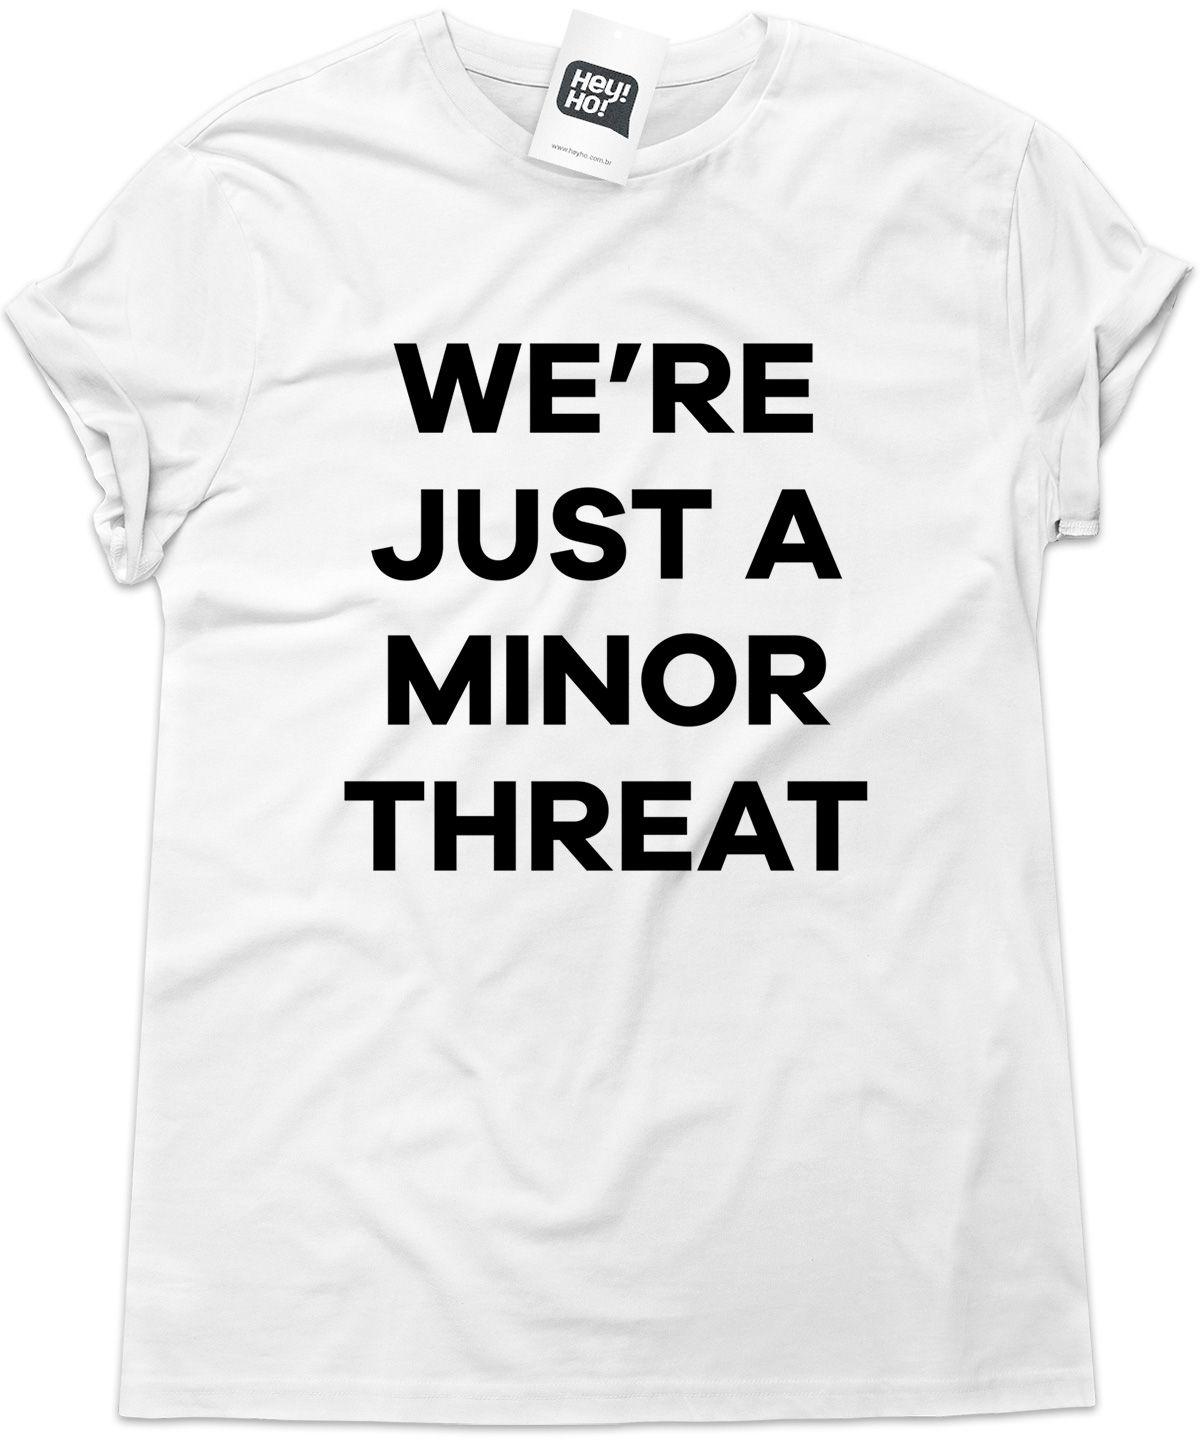 MINOR THREAT - We're just a minor threat